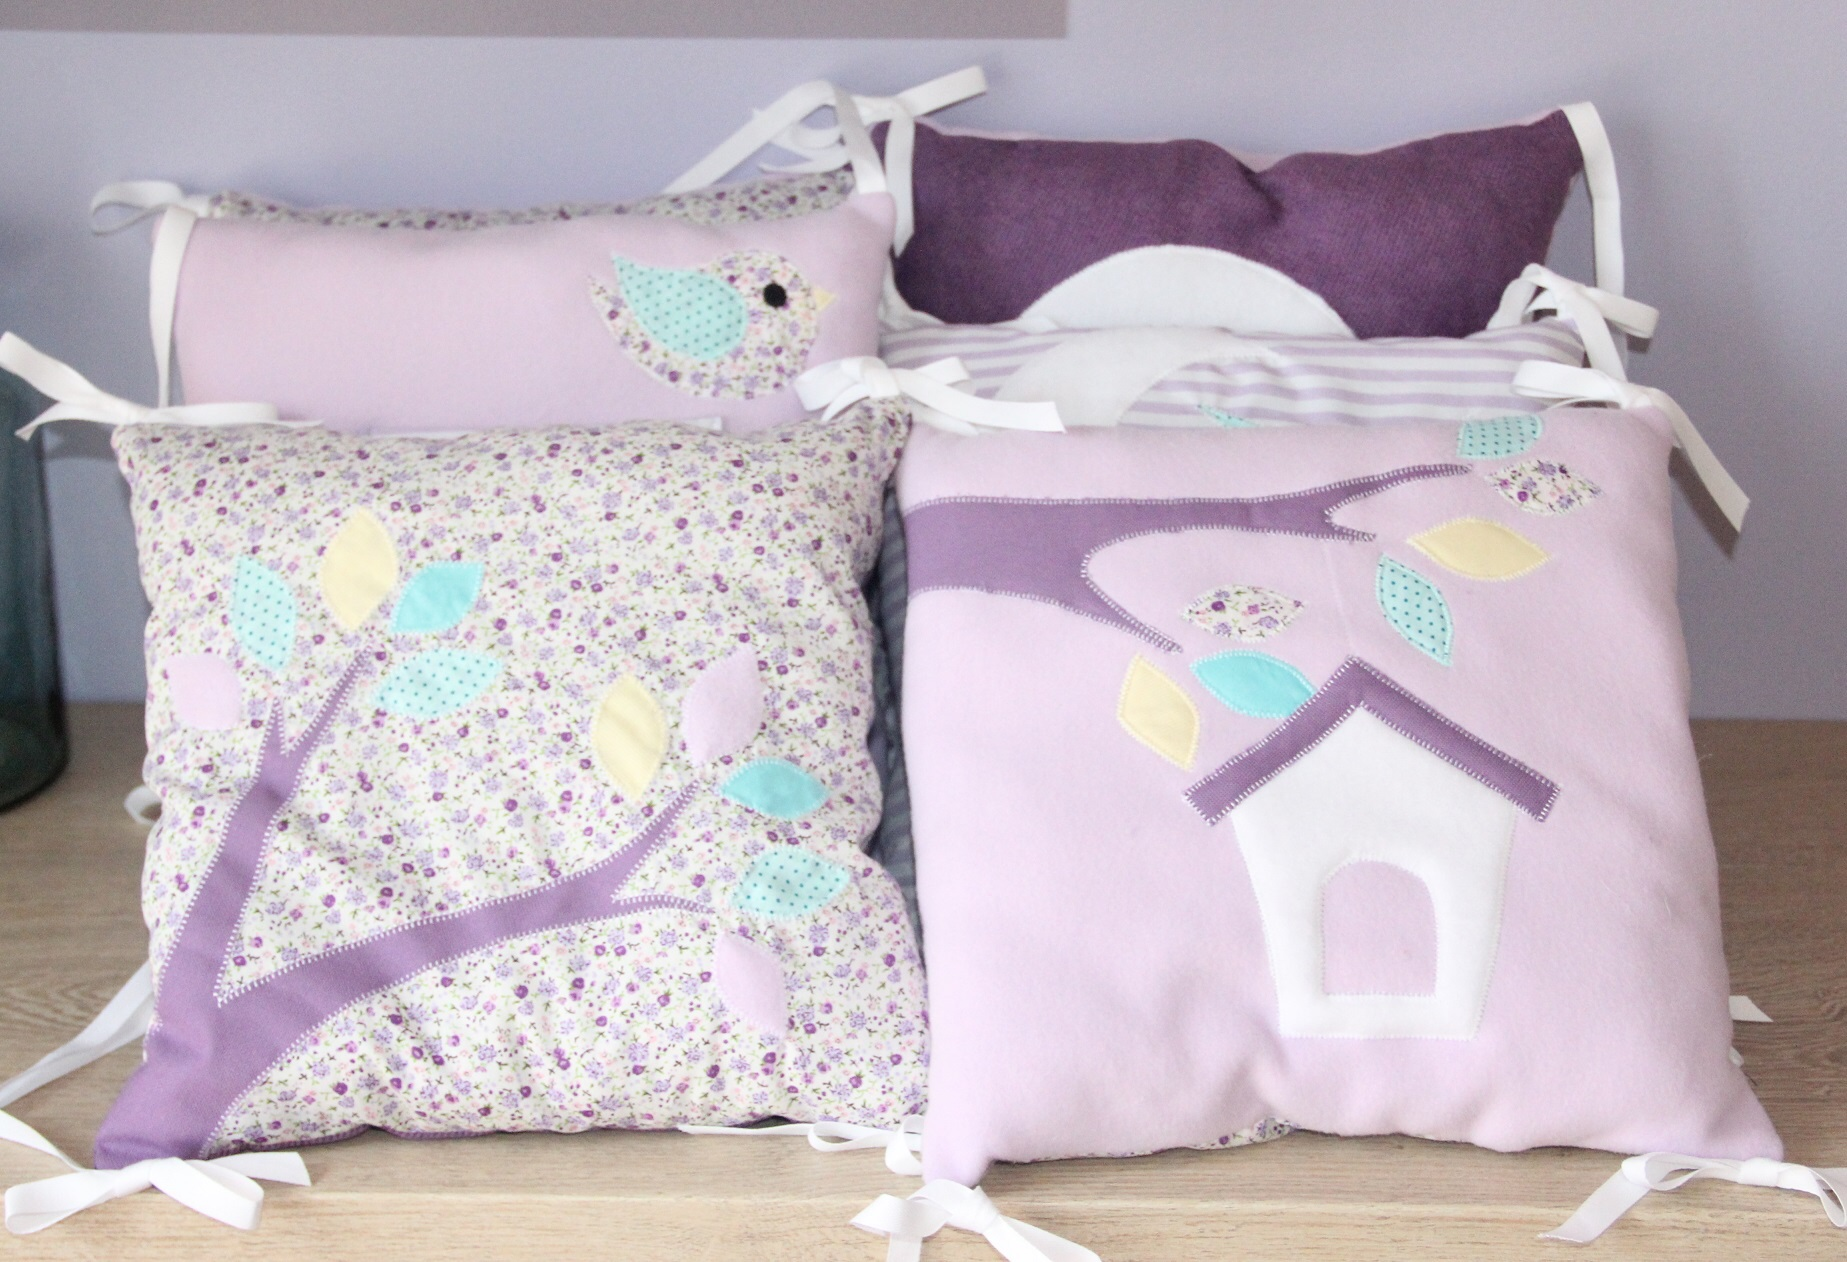 tour de lit foret parme violet turquoise ribamb 39 elles. Black Bedroom Furniture Sets. Home Design Ideas